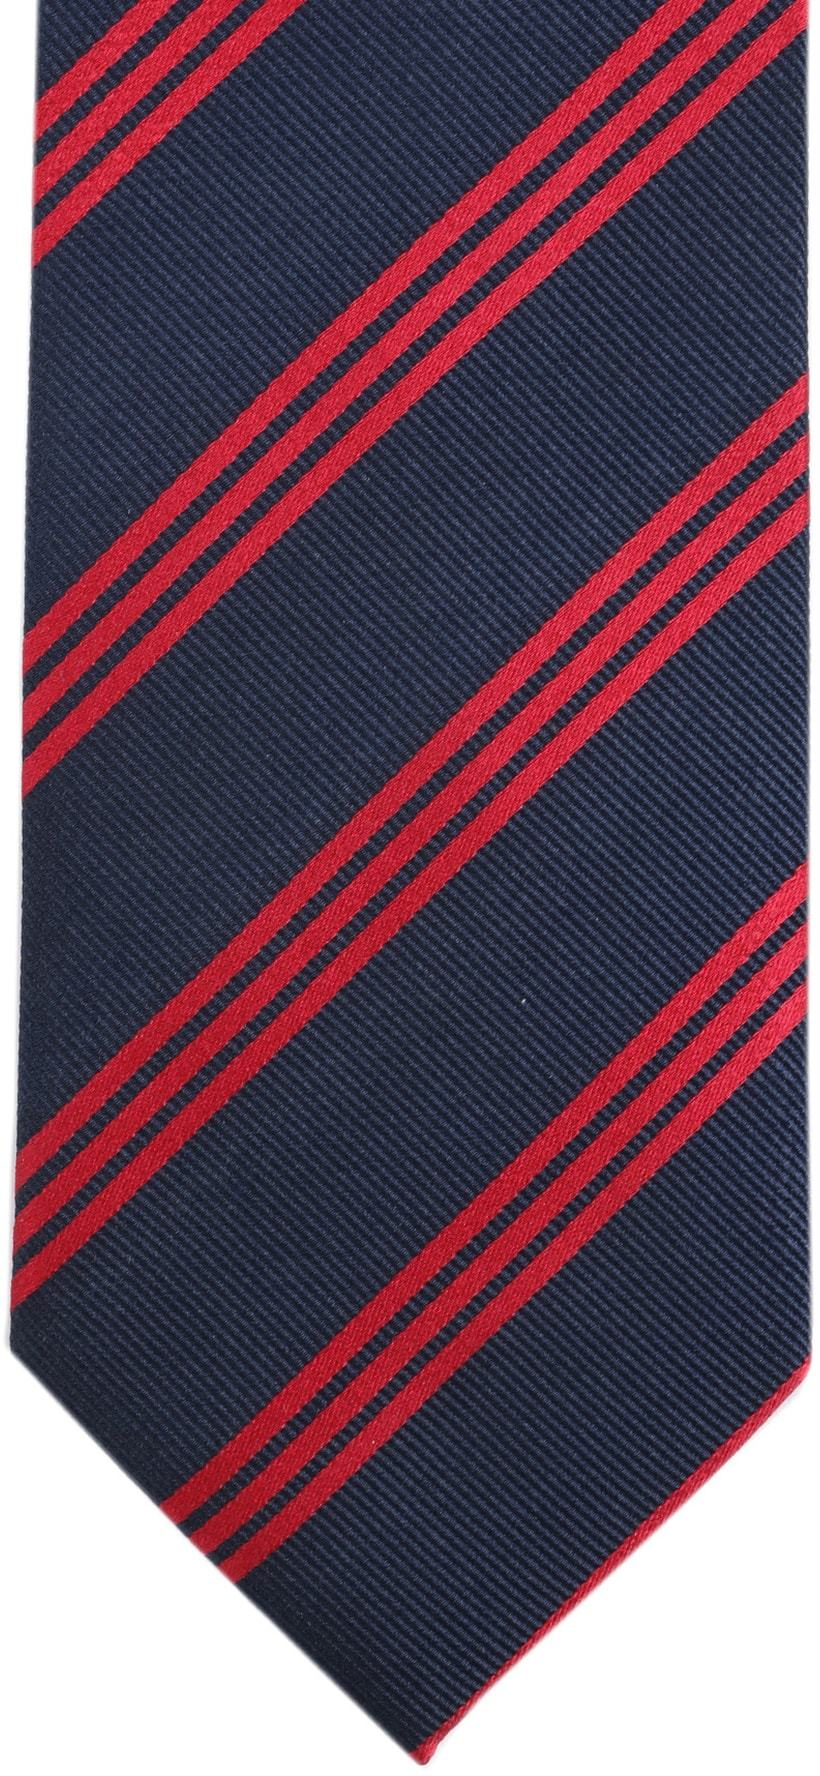 Krawatte Seide Streifen Navy Rot foto 2